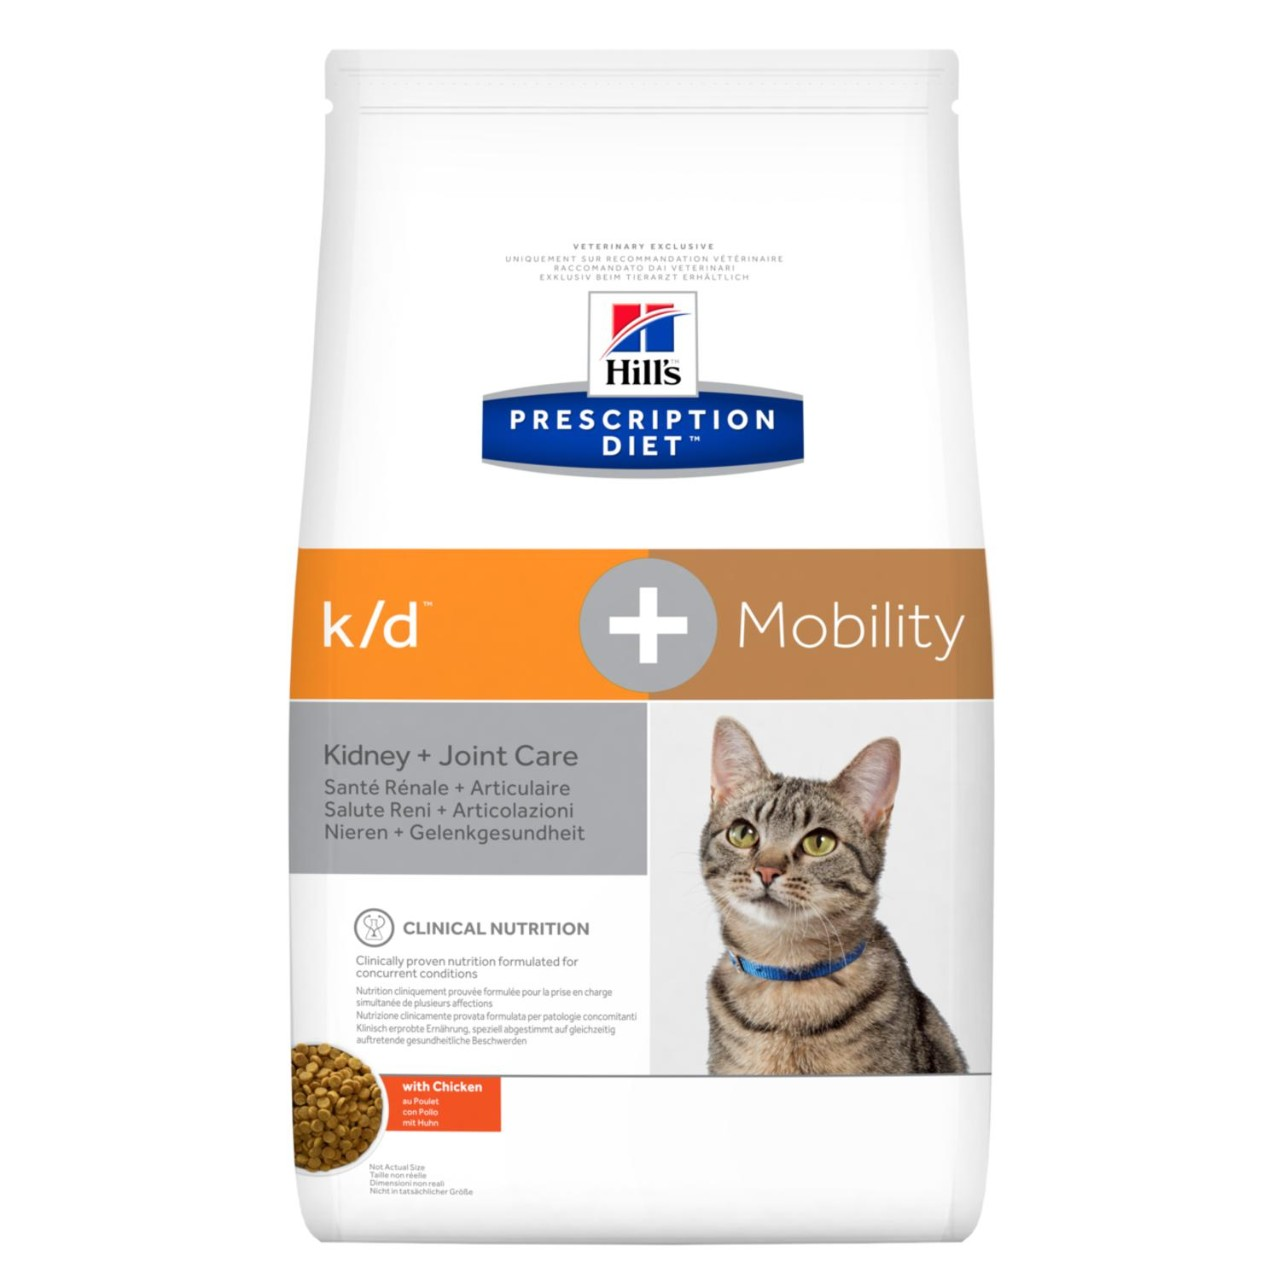 Prescription Diet k/d + Mobility kattfoder med kyckling